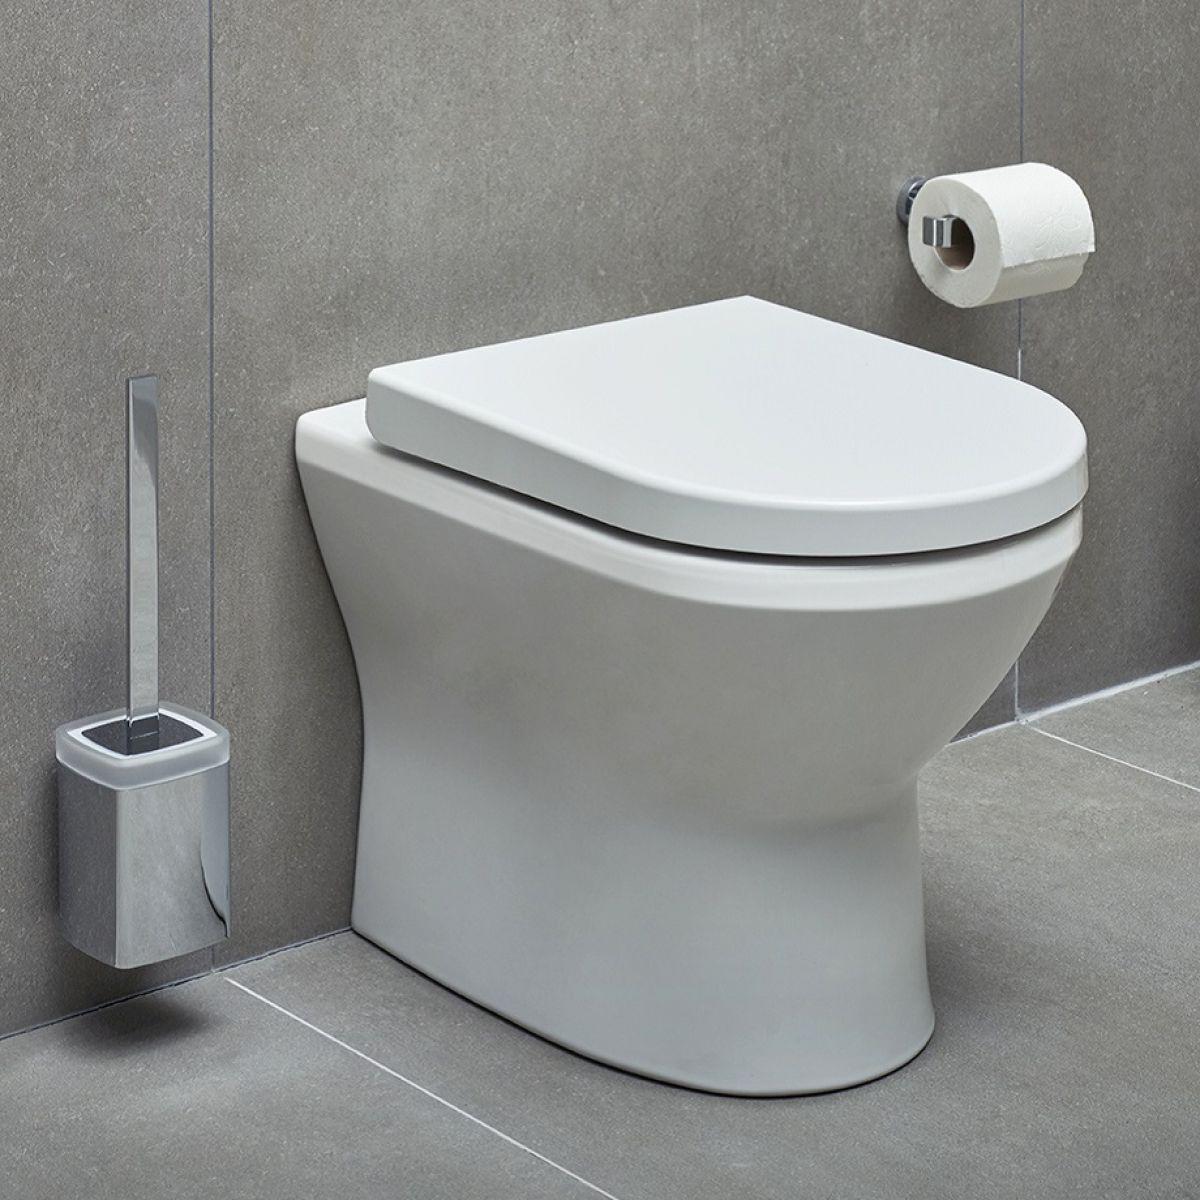 Swell Vitra Integra Rimless Floor Standing Toilet Creativecarmelina Interior Chair Design Creativecarmelinacom